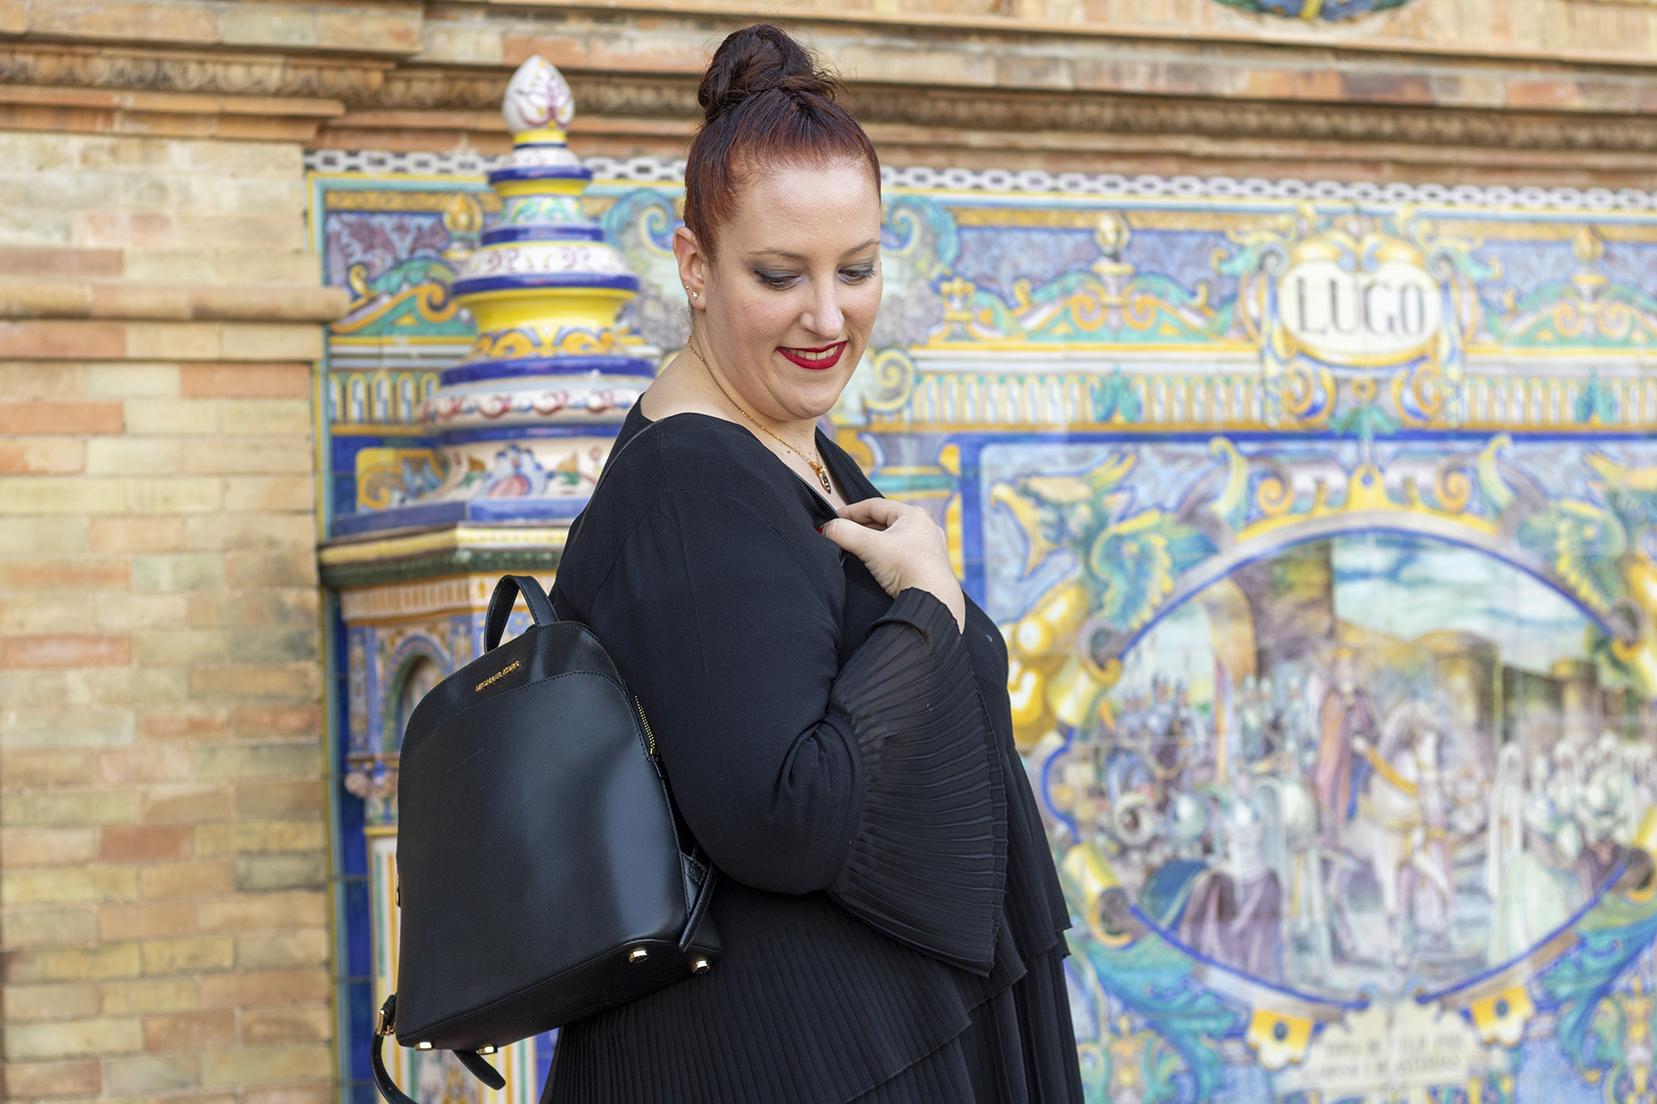 Paloma Silla Destáca-te. Tallas Grandes Black Zara